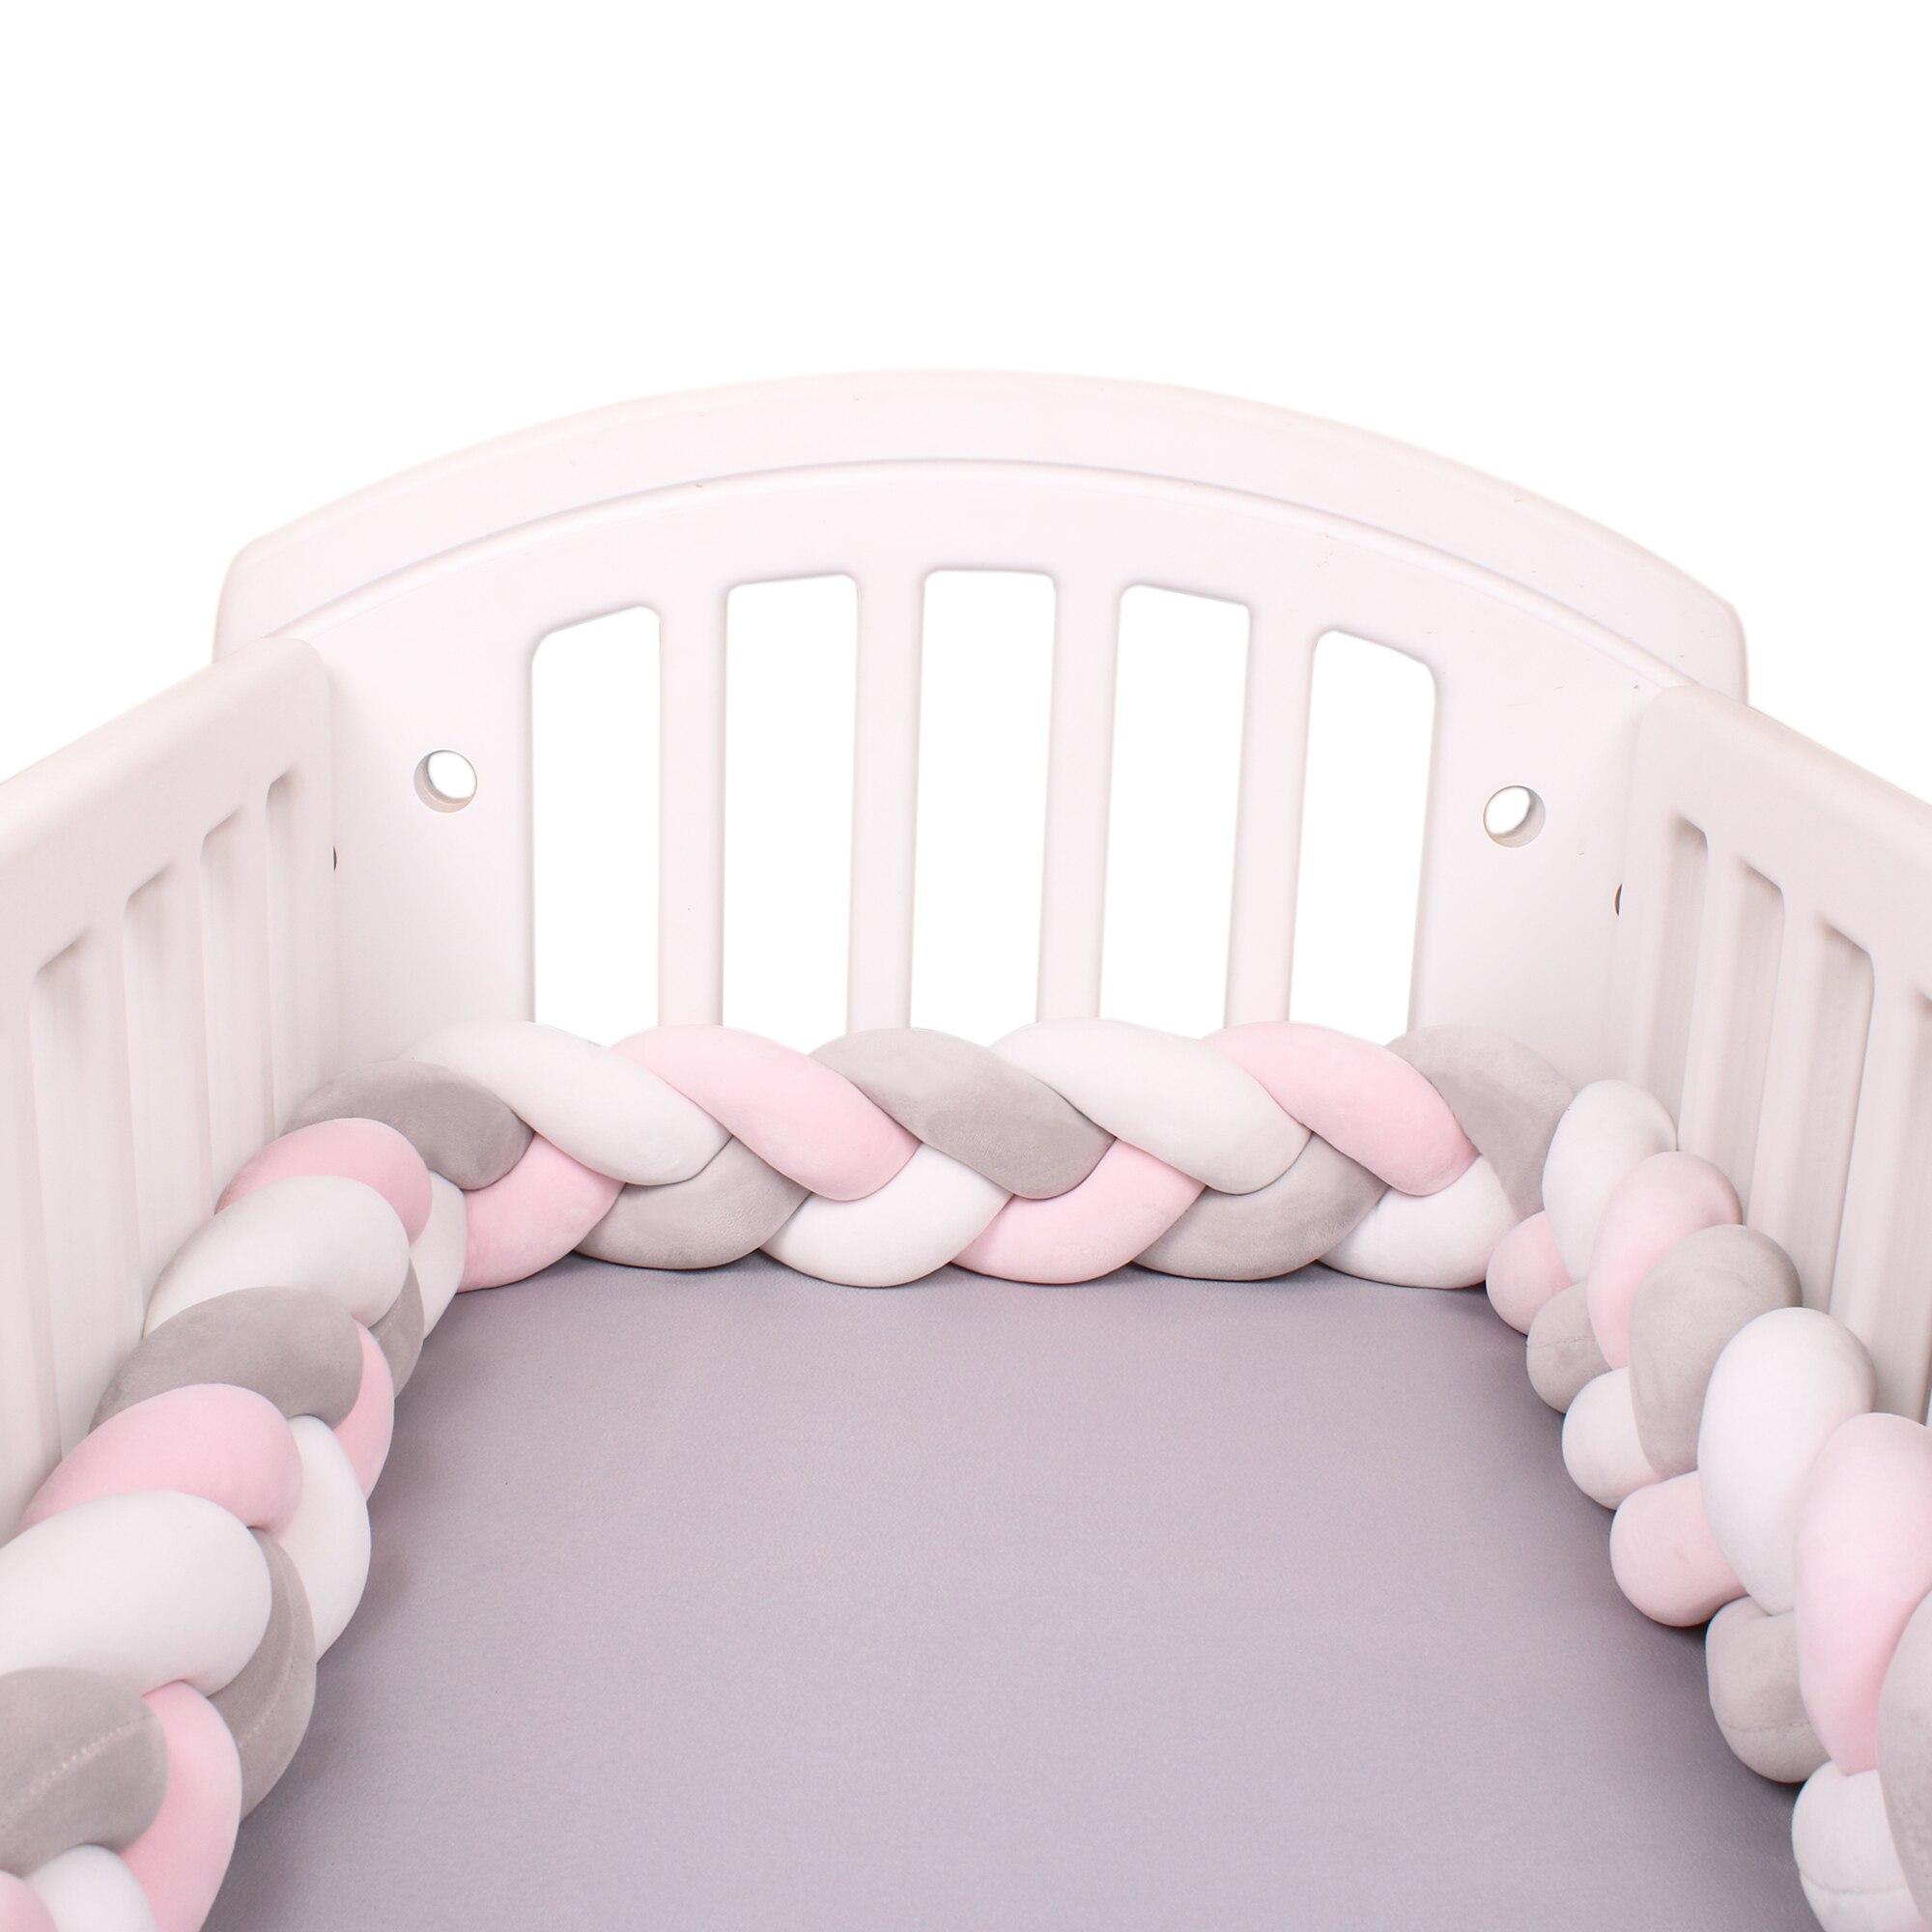 1M/2M/3M/4M Länge Neugeborenen Baby Bett Stoßstange Reinem Weben Plüsch Knoten krippe Stoßfänger Kinder Bett Babybett Schutz Baby Room Decor